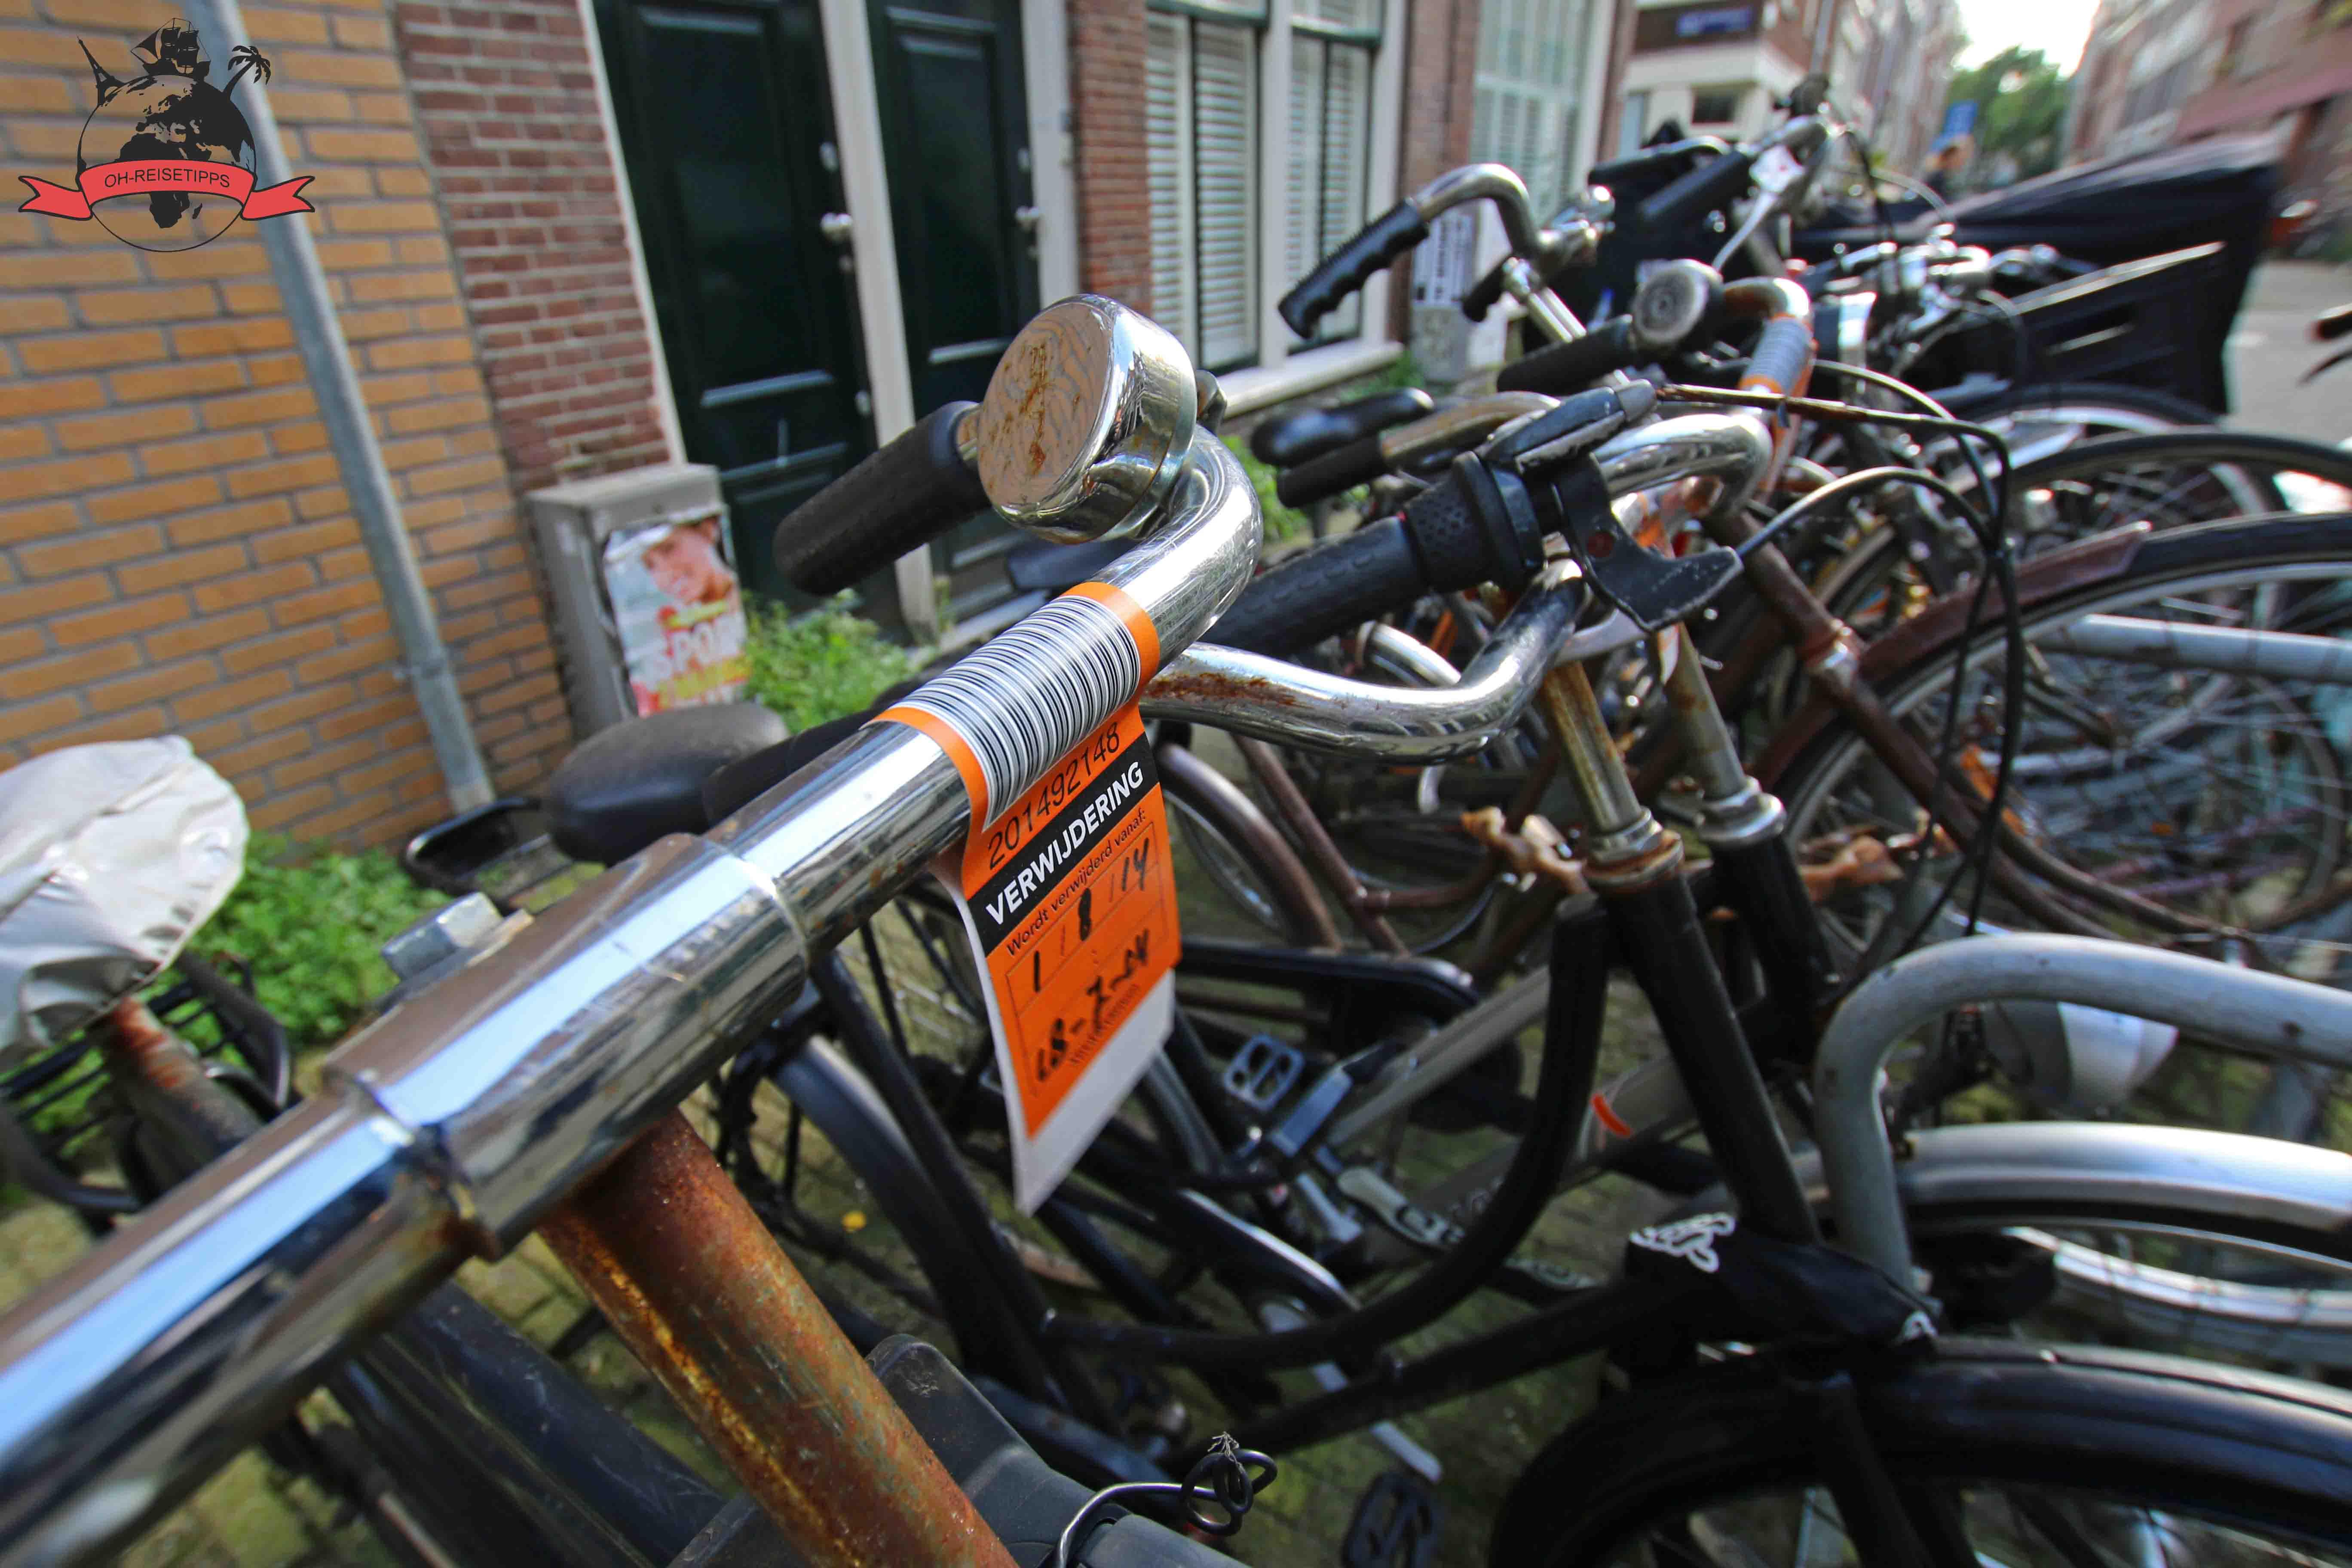 niederlande-amsterdam-jordaan-fahrraeder